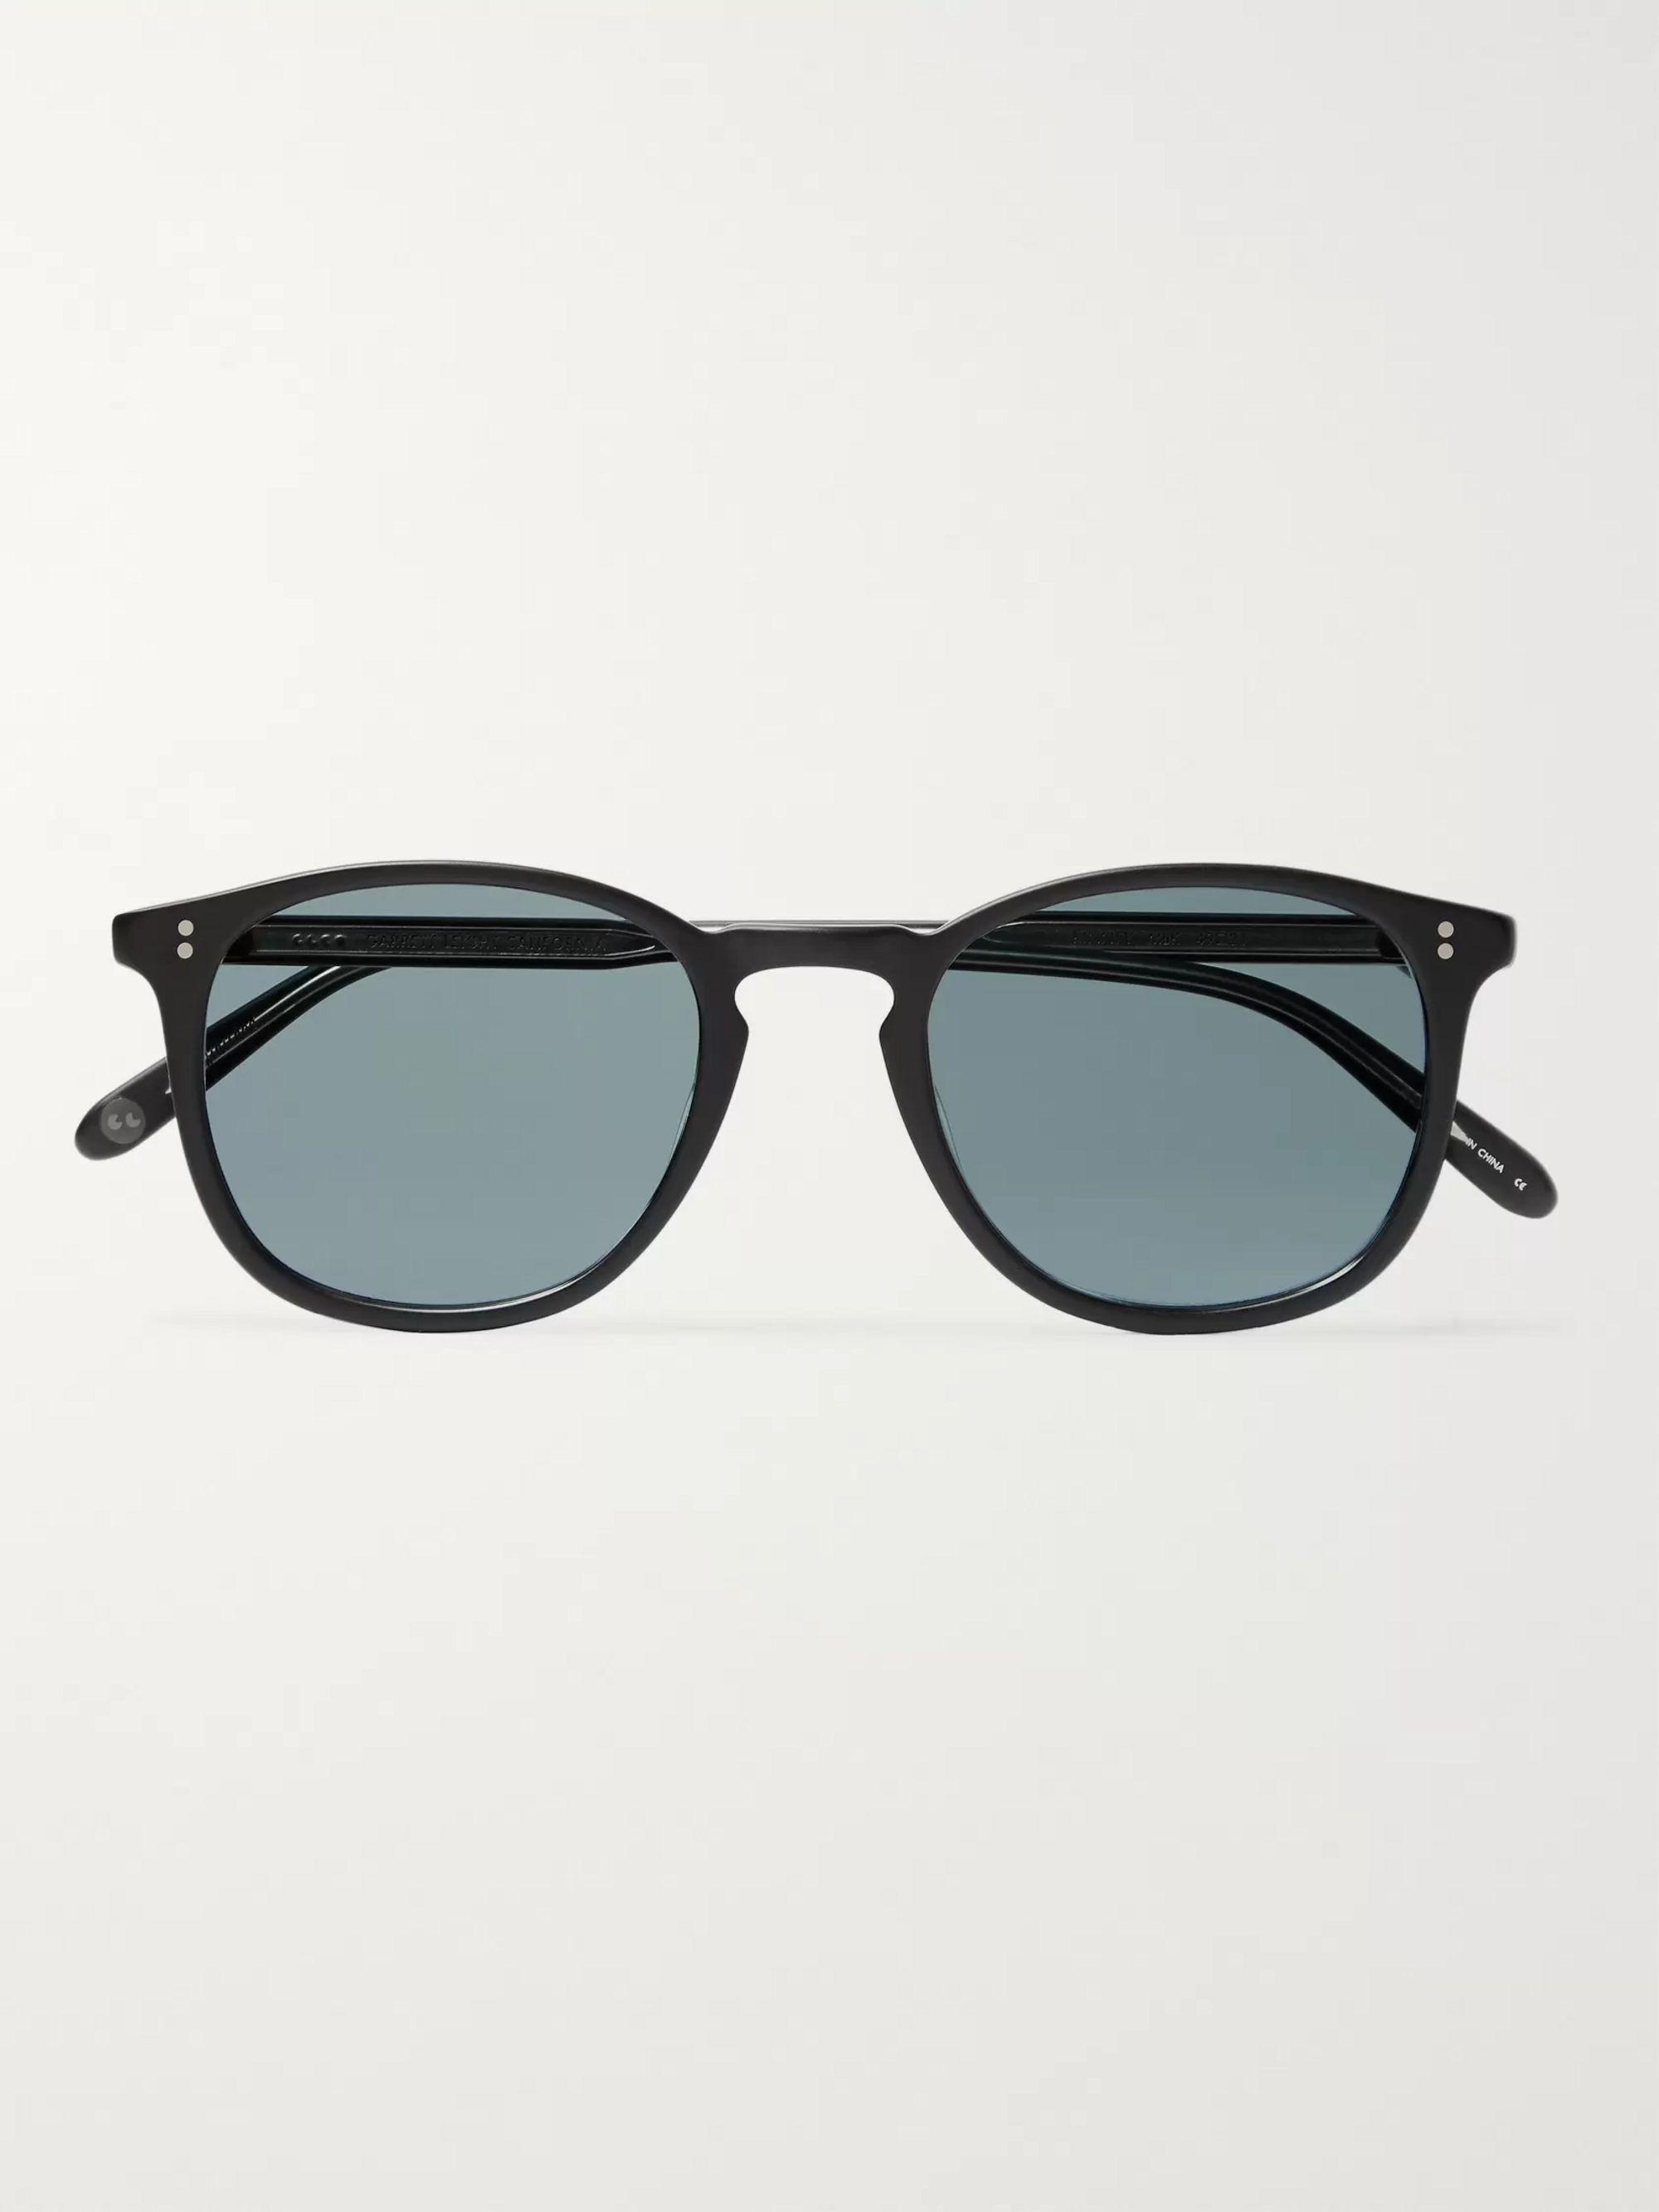 Kinney 49 D Frame Matte Acetate Sunglasses by Garrett Leight California Optical